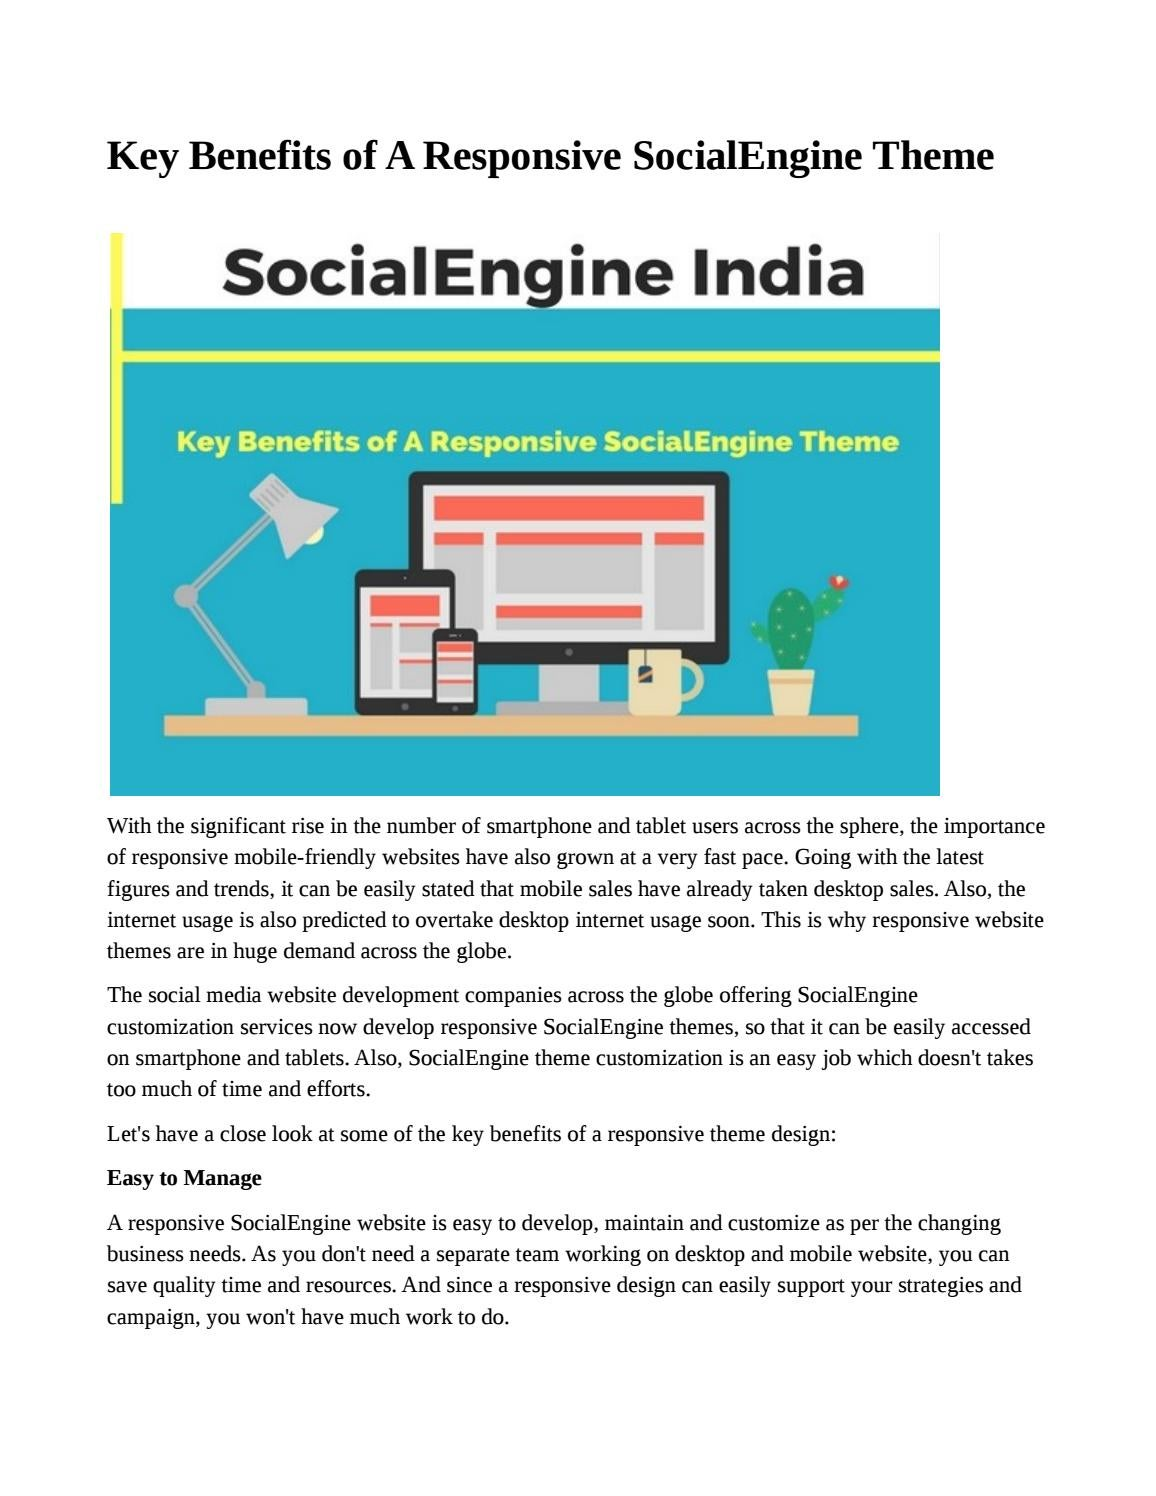 téma téma socialengine